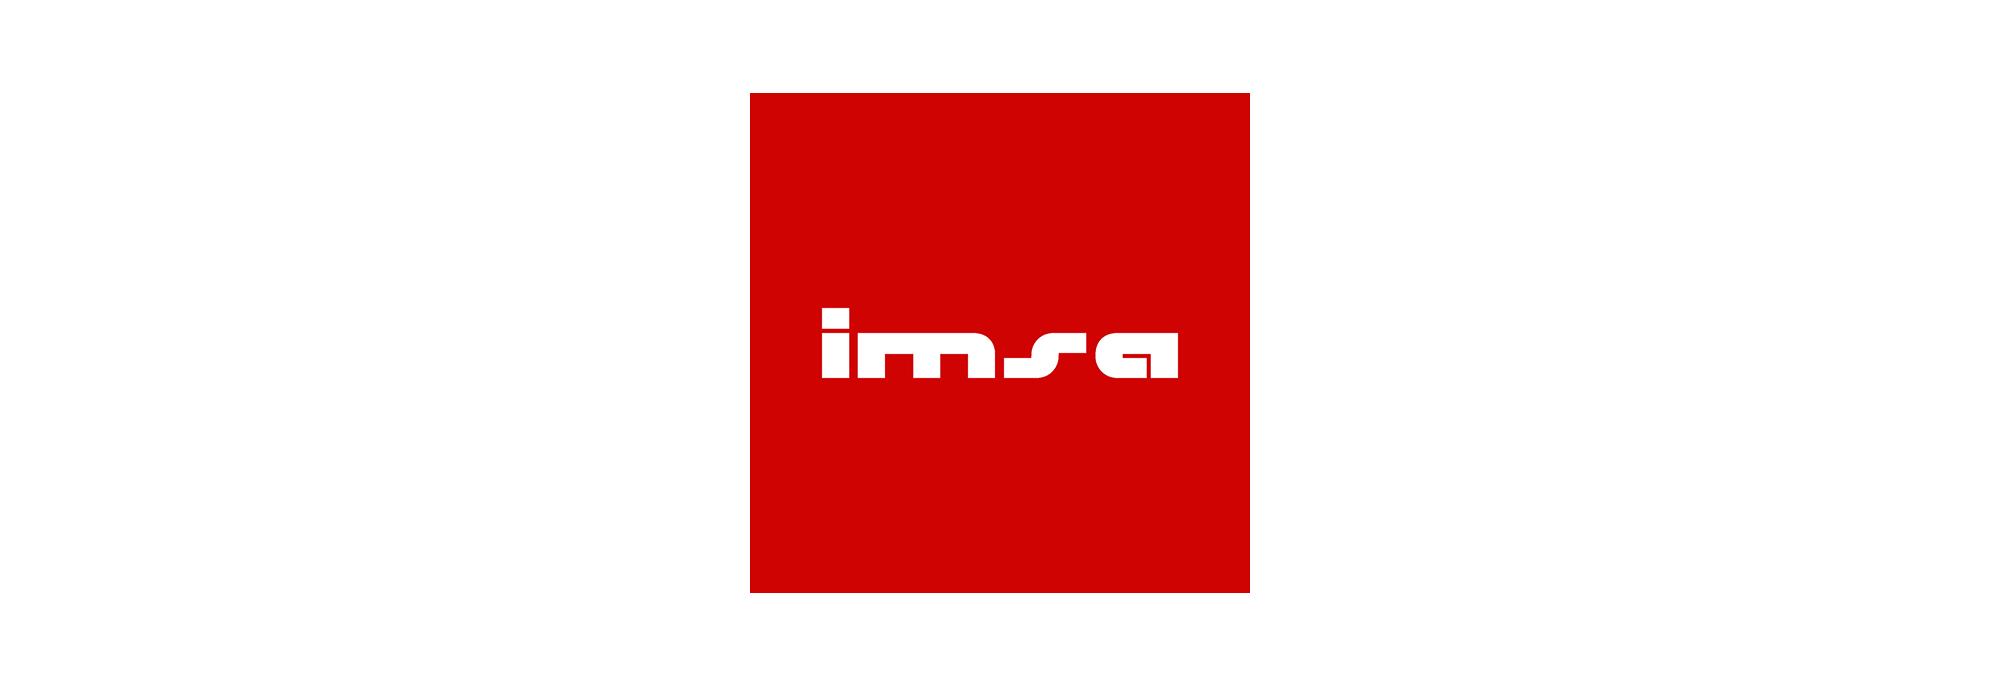 2006 Kleemann renamed to IMSA